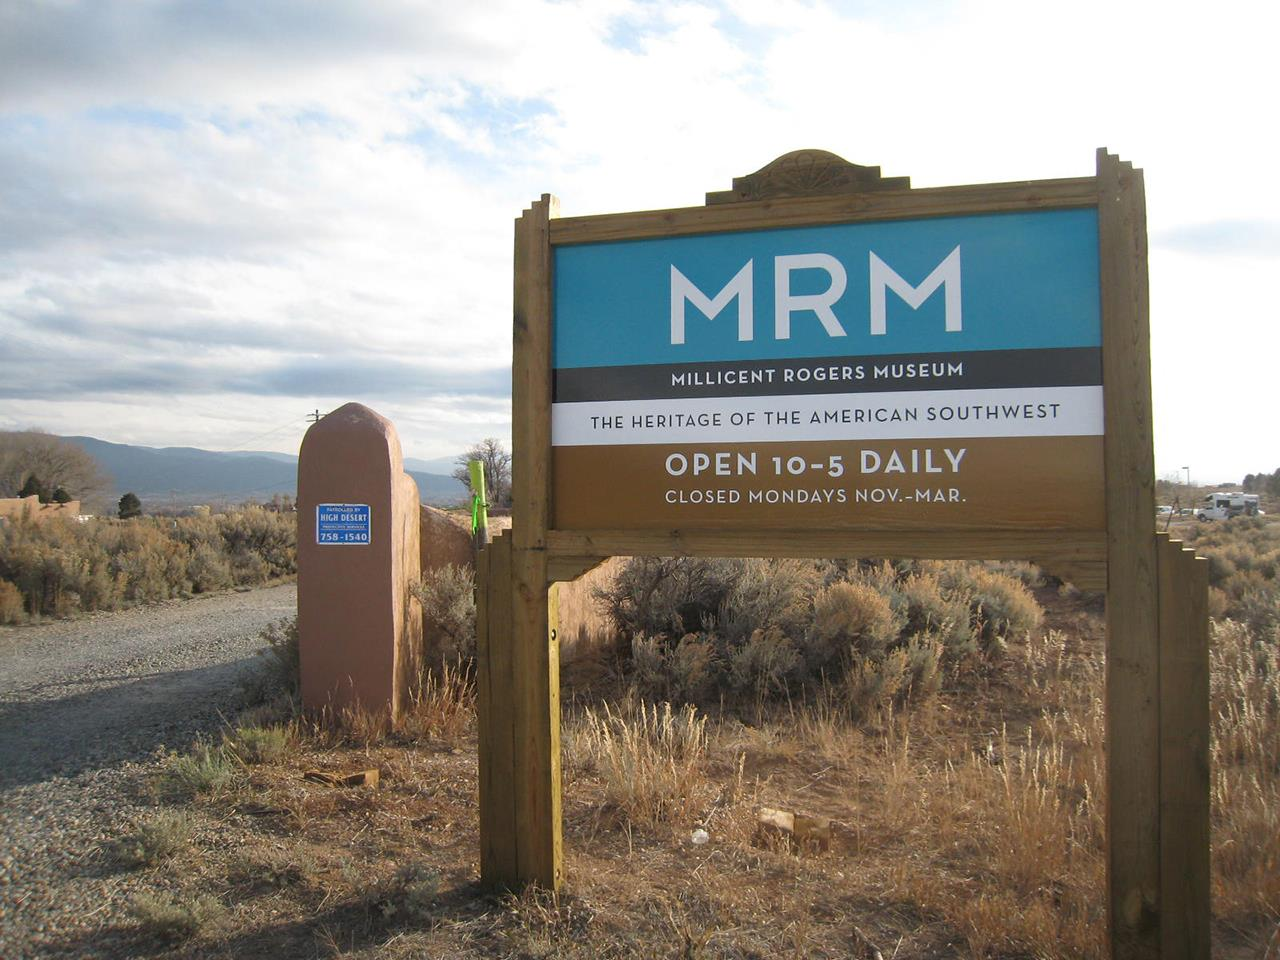 #Taos neighborhoods #El Prado #Millicent Rogers Museum #Taos #New Mexico